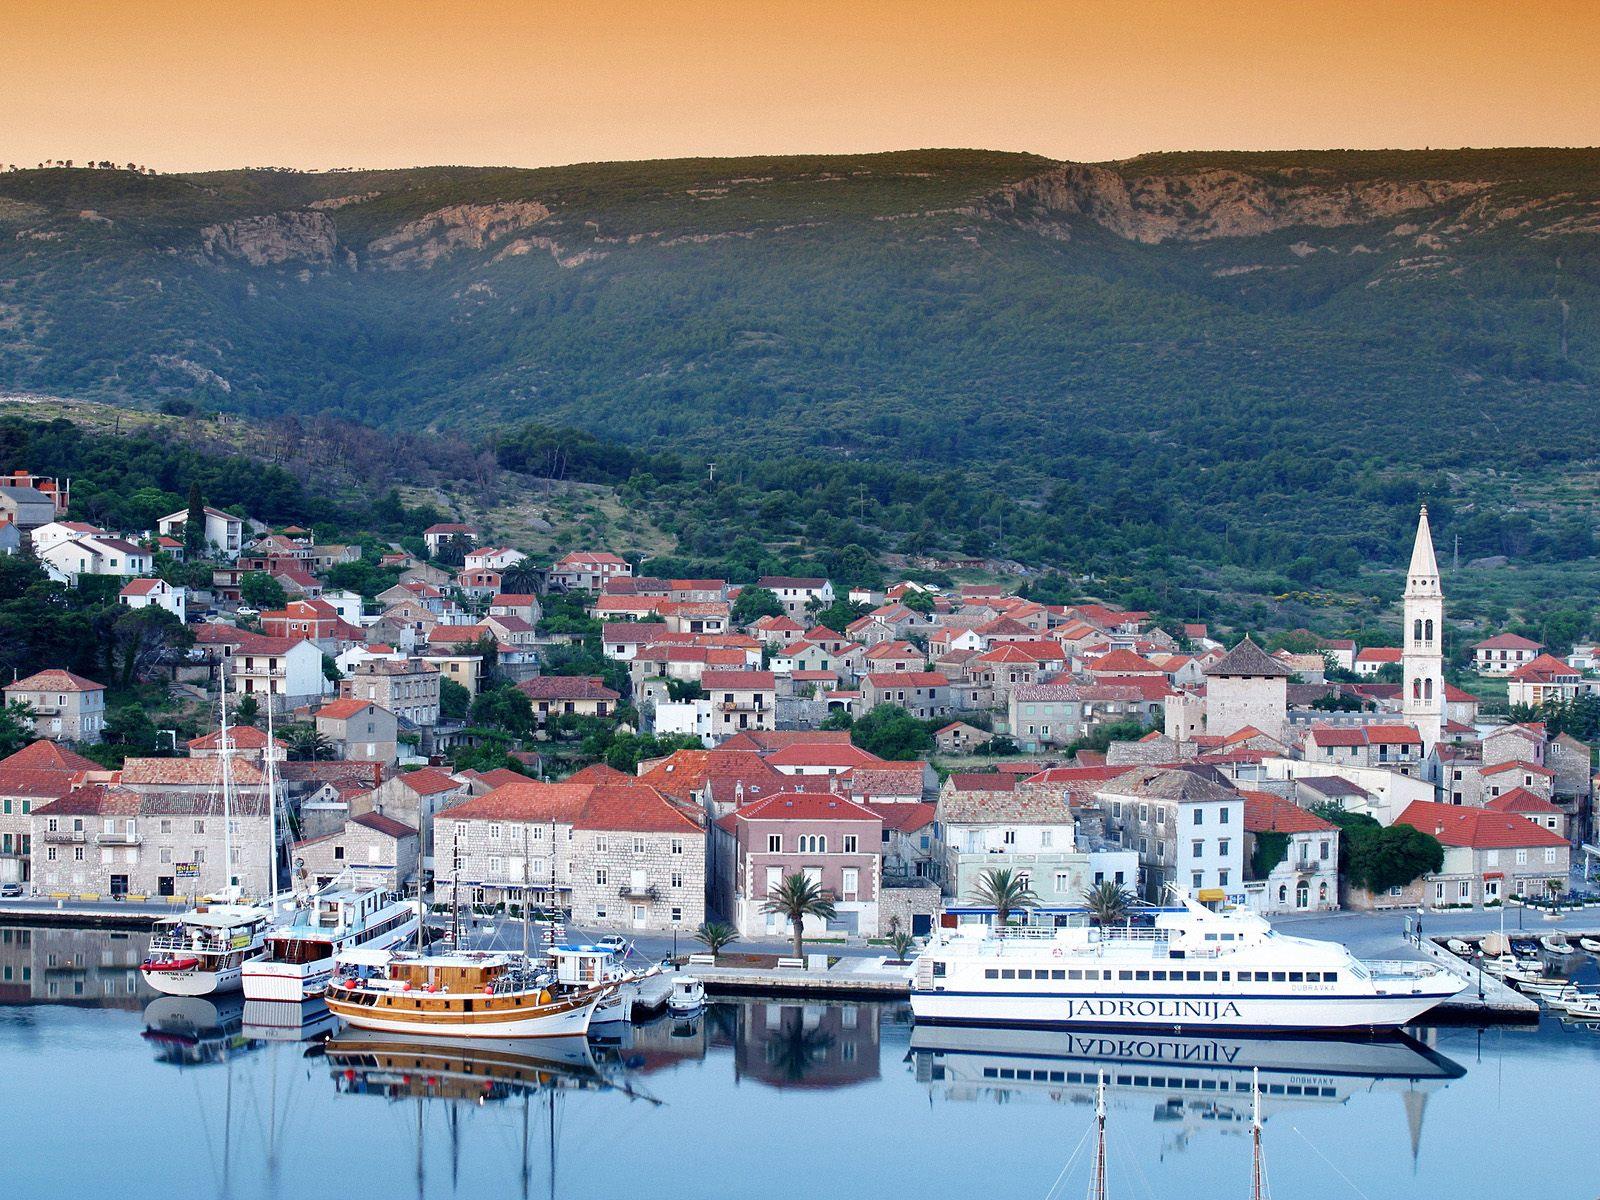 http://4.bp.blogspot.com/-QksdG63mGz0/TrvYWhqnKXI/AAAAAAAABGY/eo2aEJfplow/s1600/Port+of+Jelsa%252C+Hvar+Island%252C+Croatia.jpg